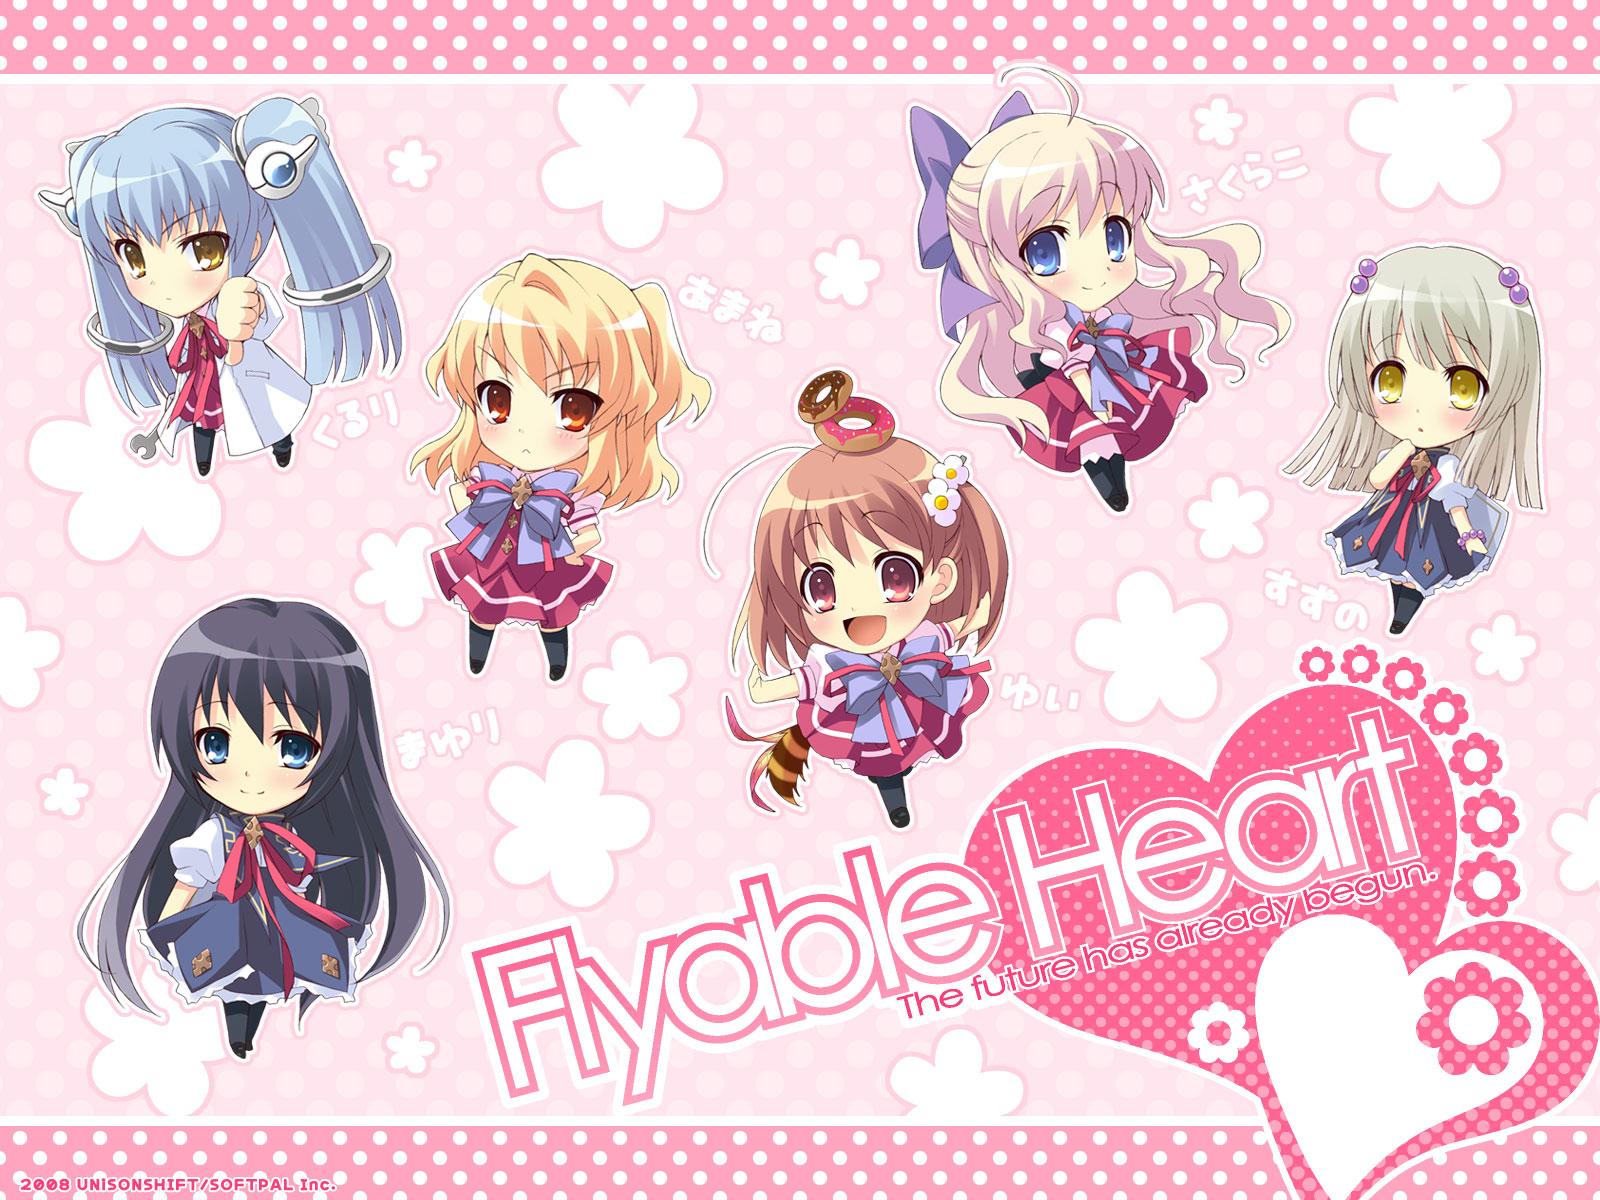 chibi flyable_heart food inaba_yui kujou_kururi minase_sakurako school_uniform shirasagi_mayuri sumeragi_amane tagme